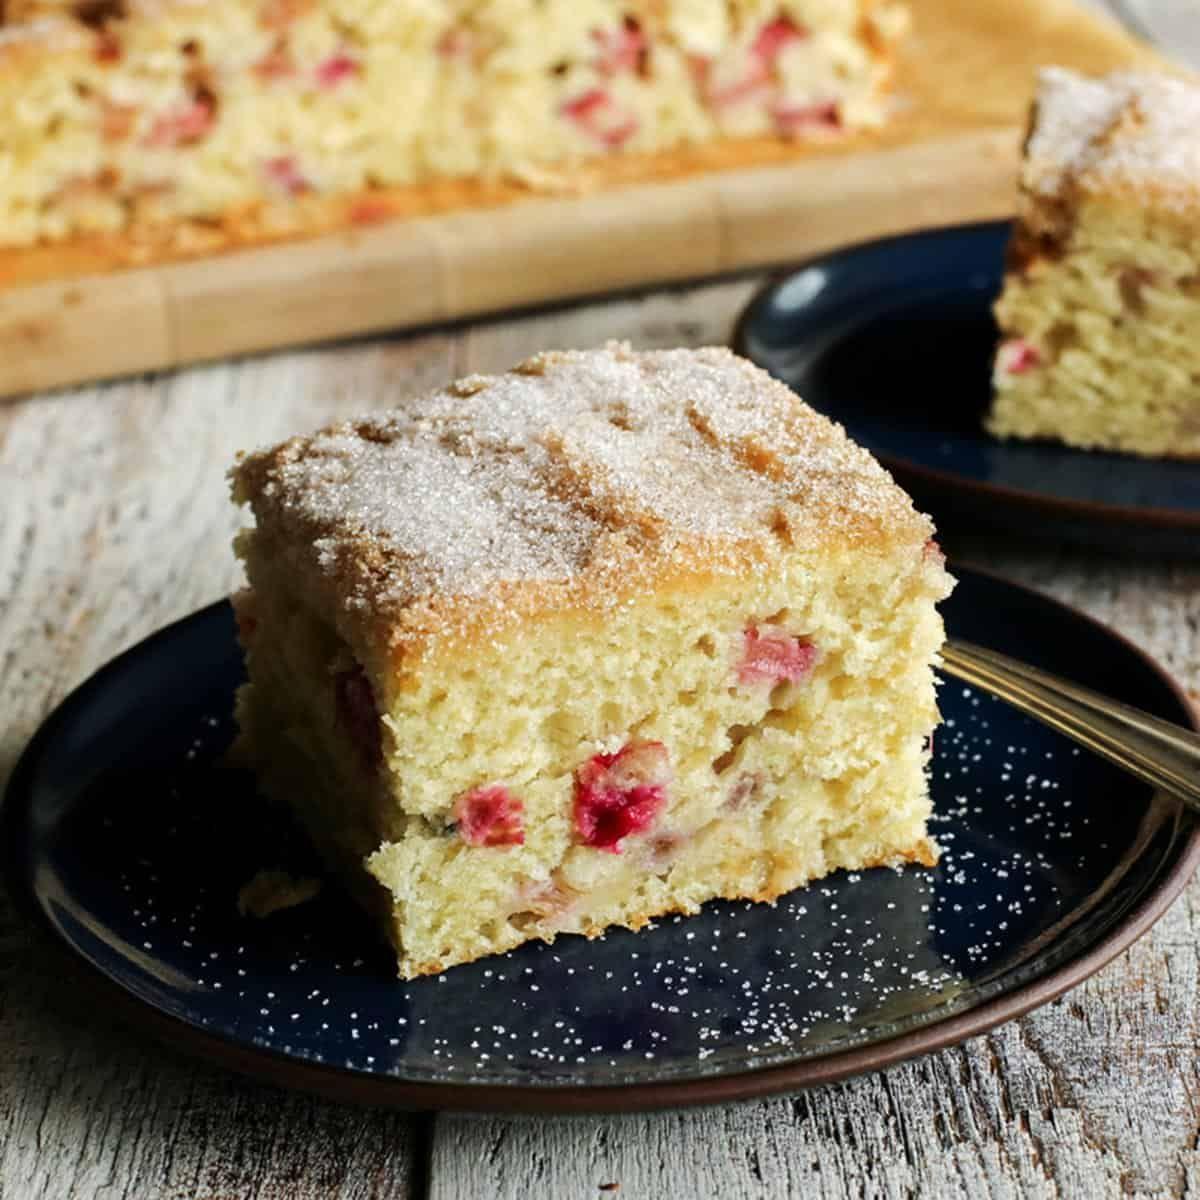 Rhubarb Sour Cream Coffee Cake Recipe Rhubarb Cake Recipes Coffee Cake Recipes Sour Cream Coffee Cake